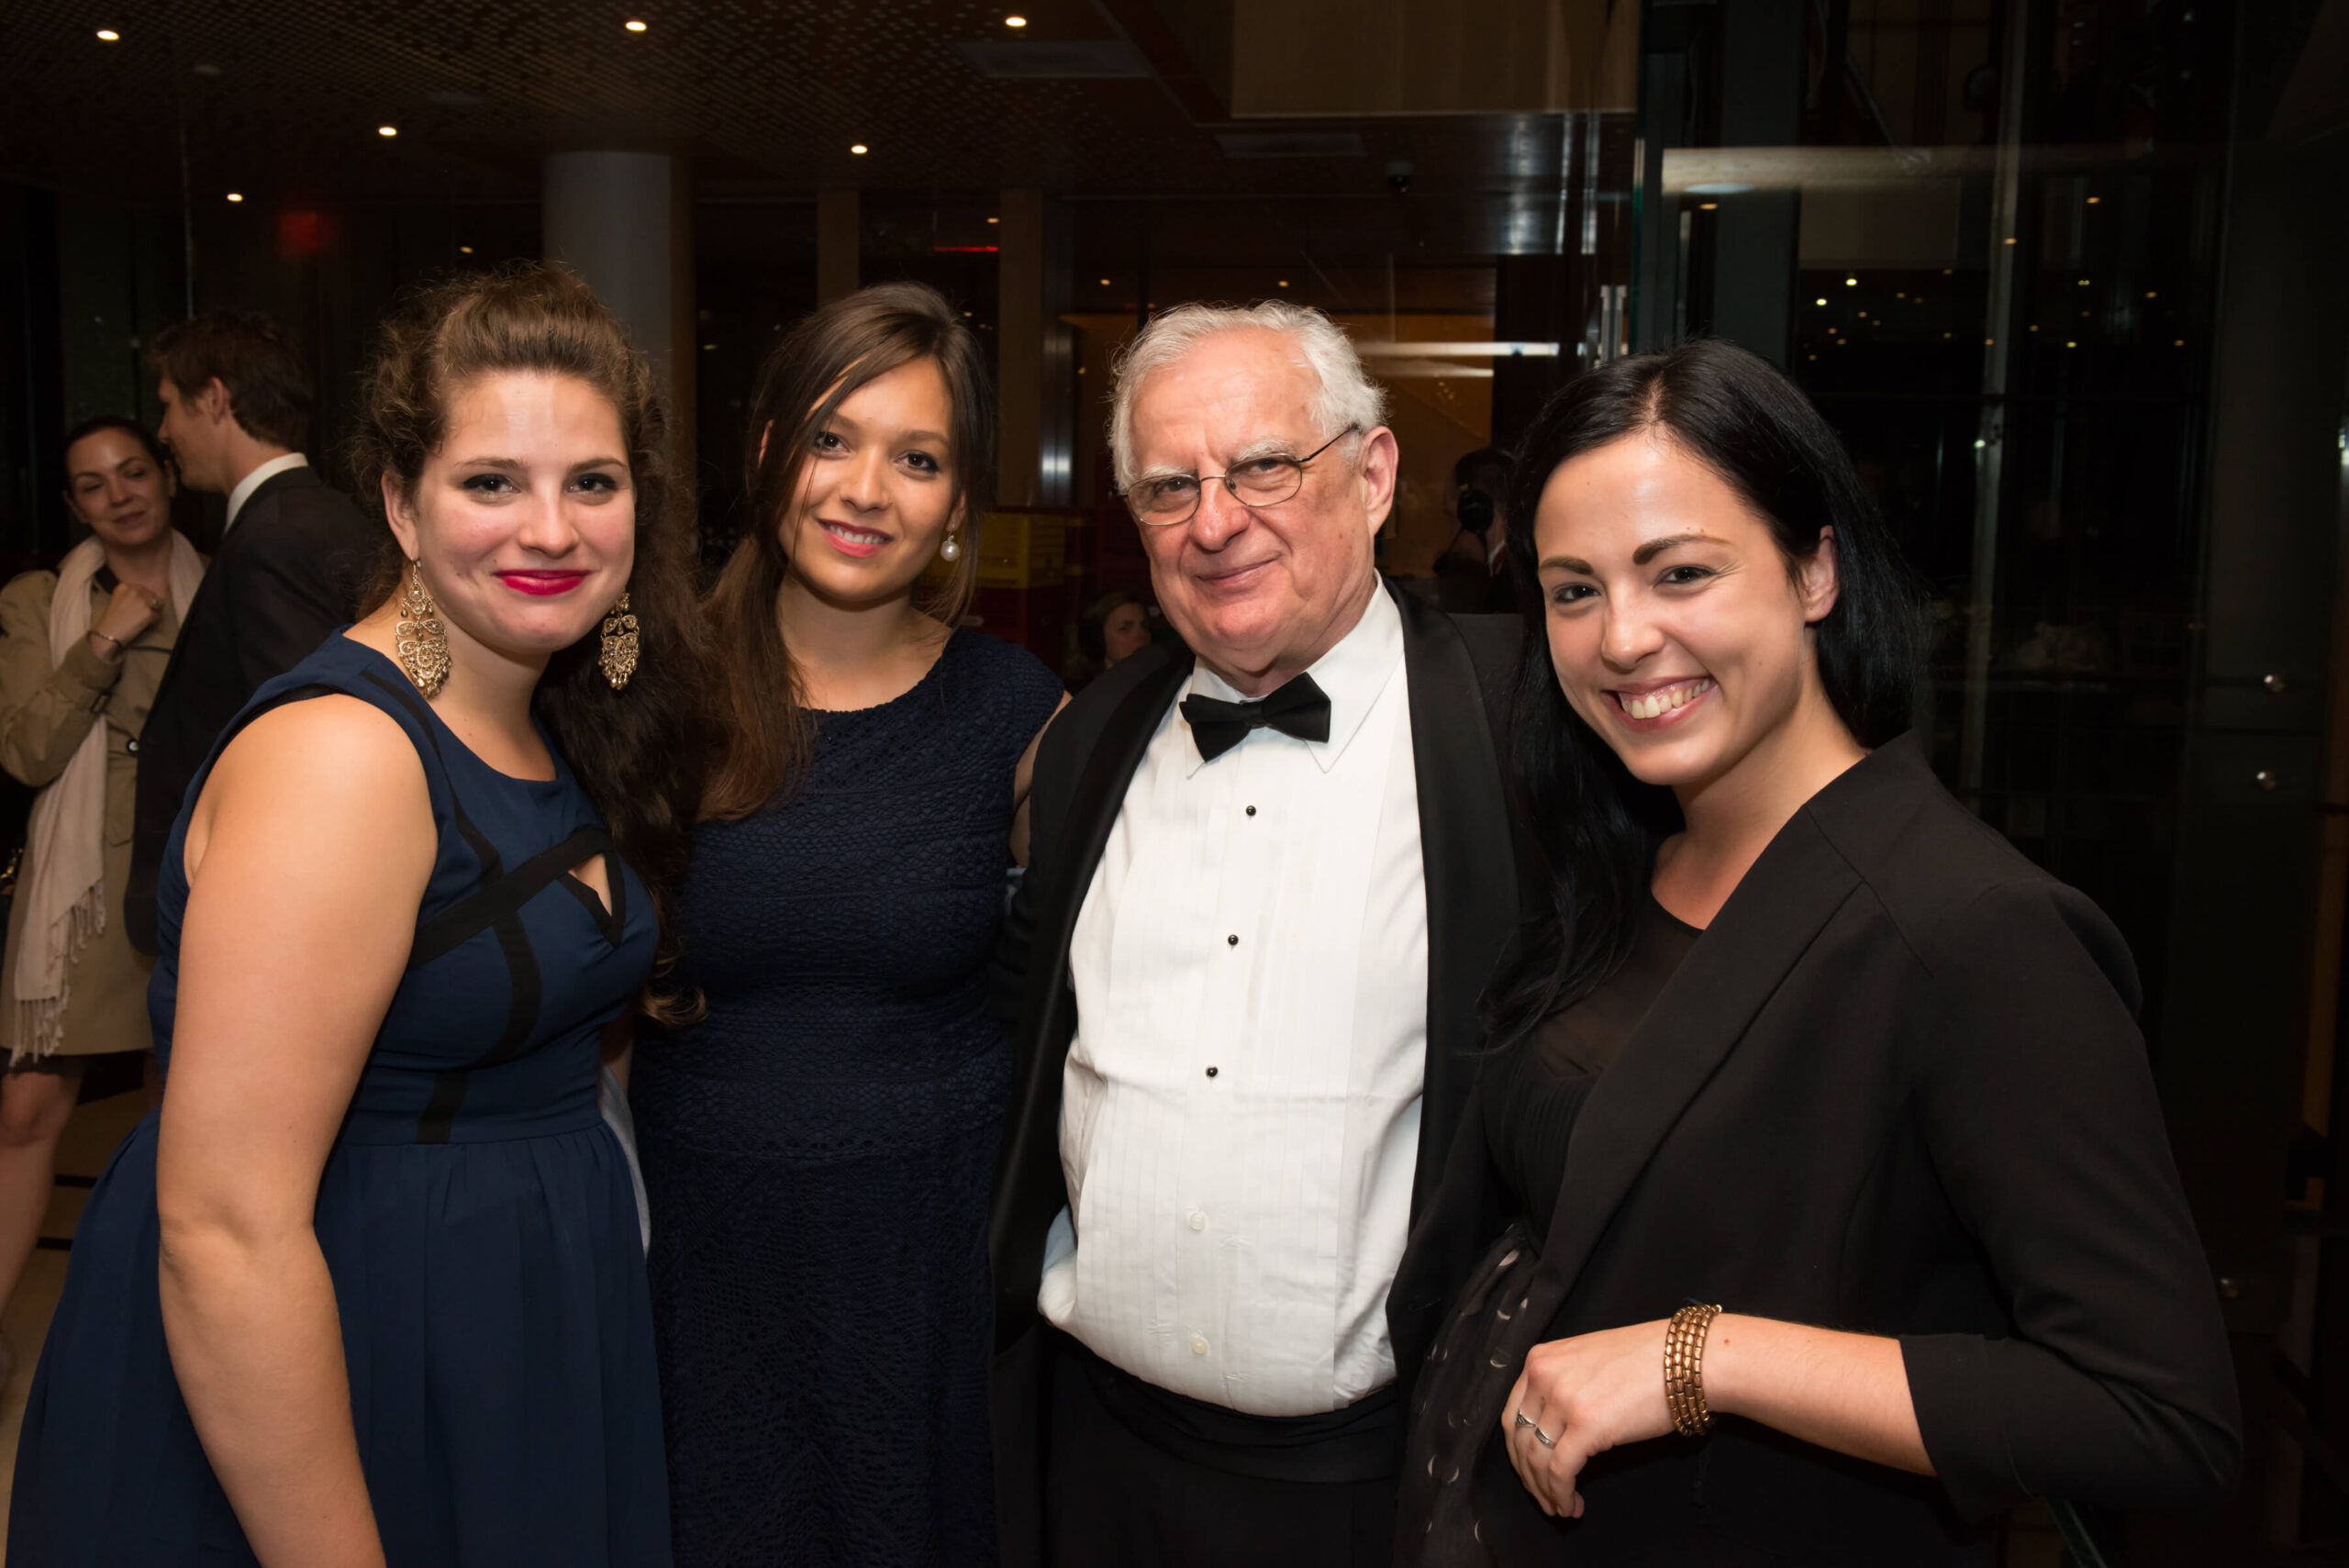 Mr. Zsolt Szekeres with Coalition interns Ms. Noémi Bánhidi, Ms. Zita Mirk and Ms. Anita Mustos